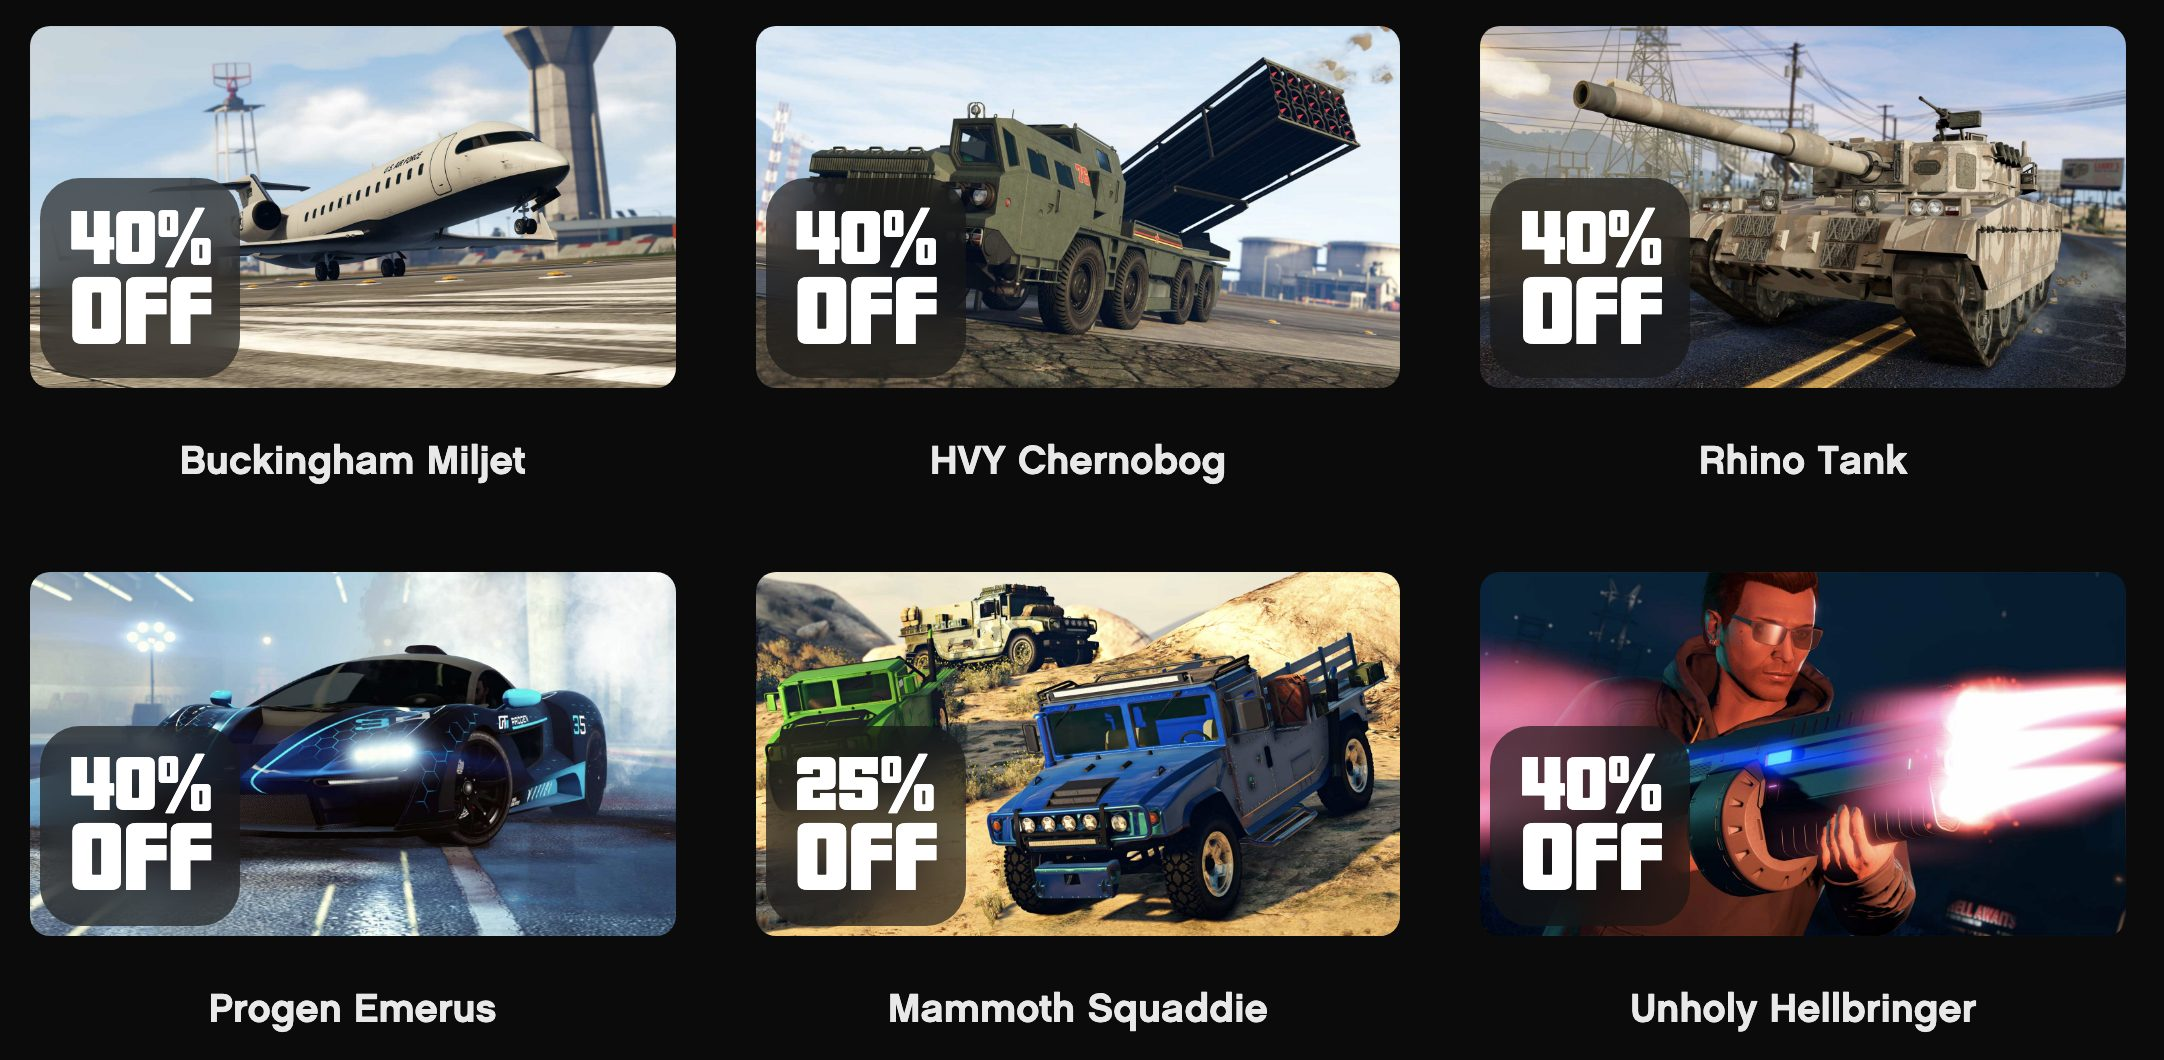 GTA Online Promotions Semaine du 11 Mars